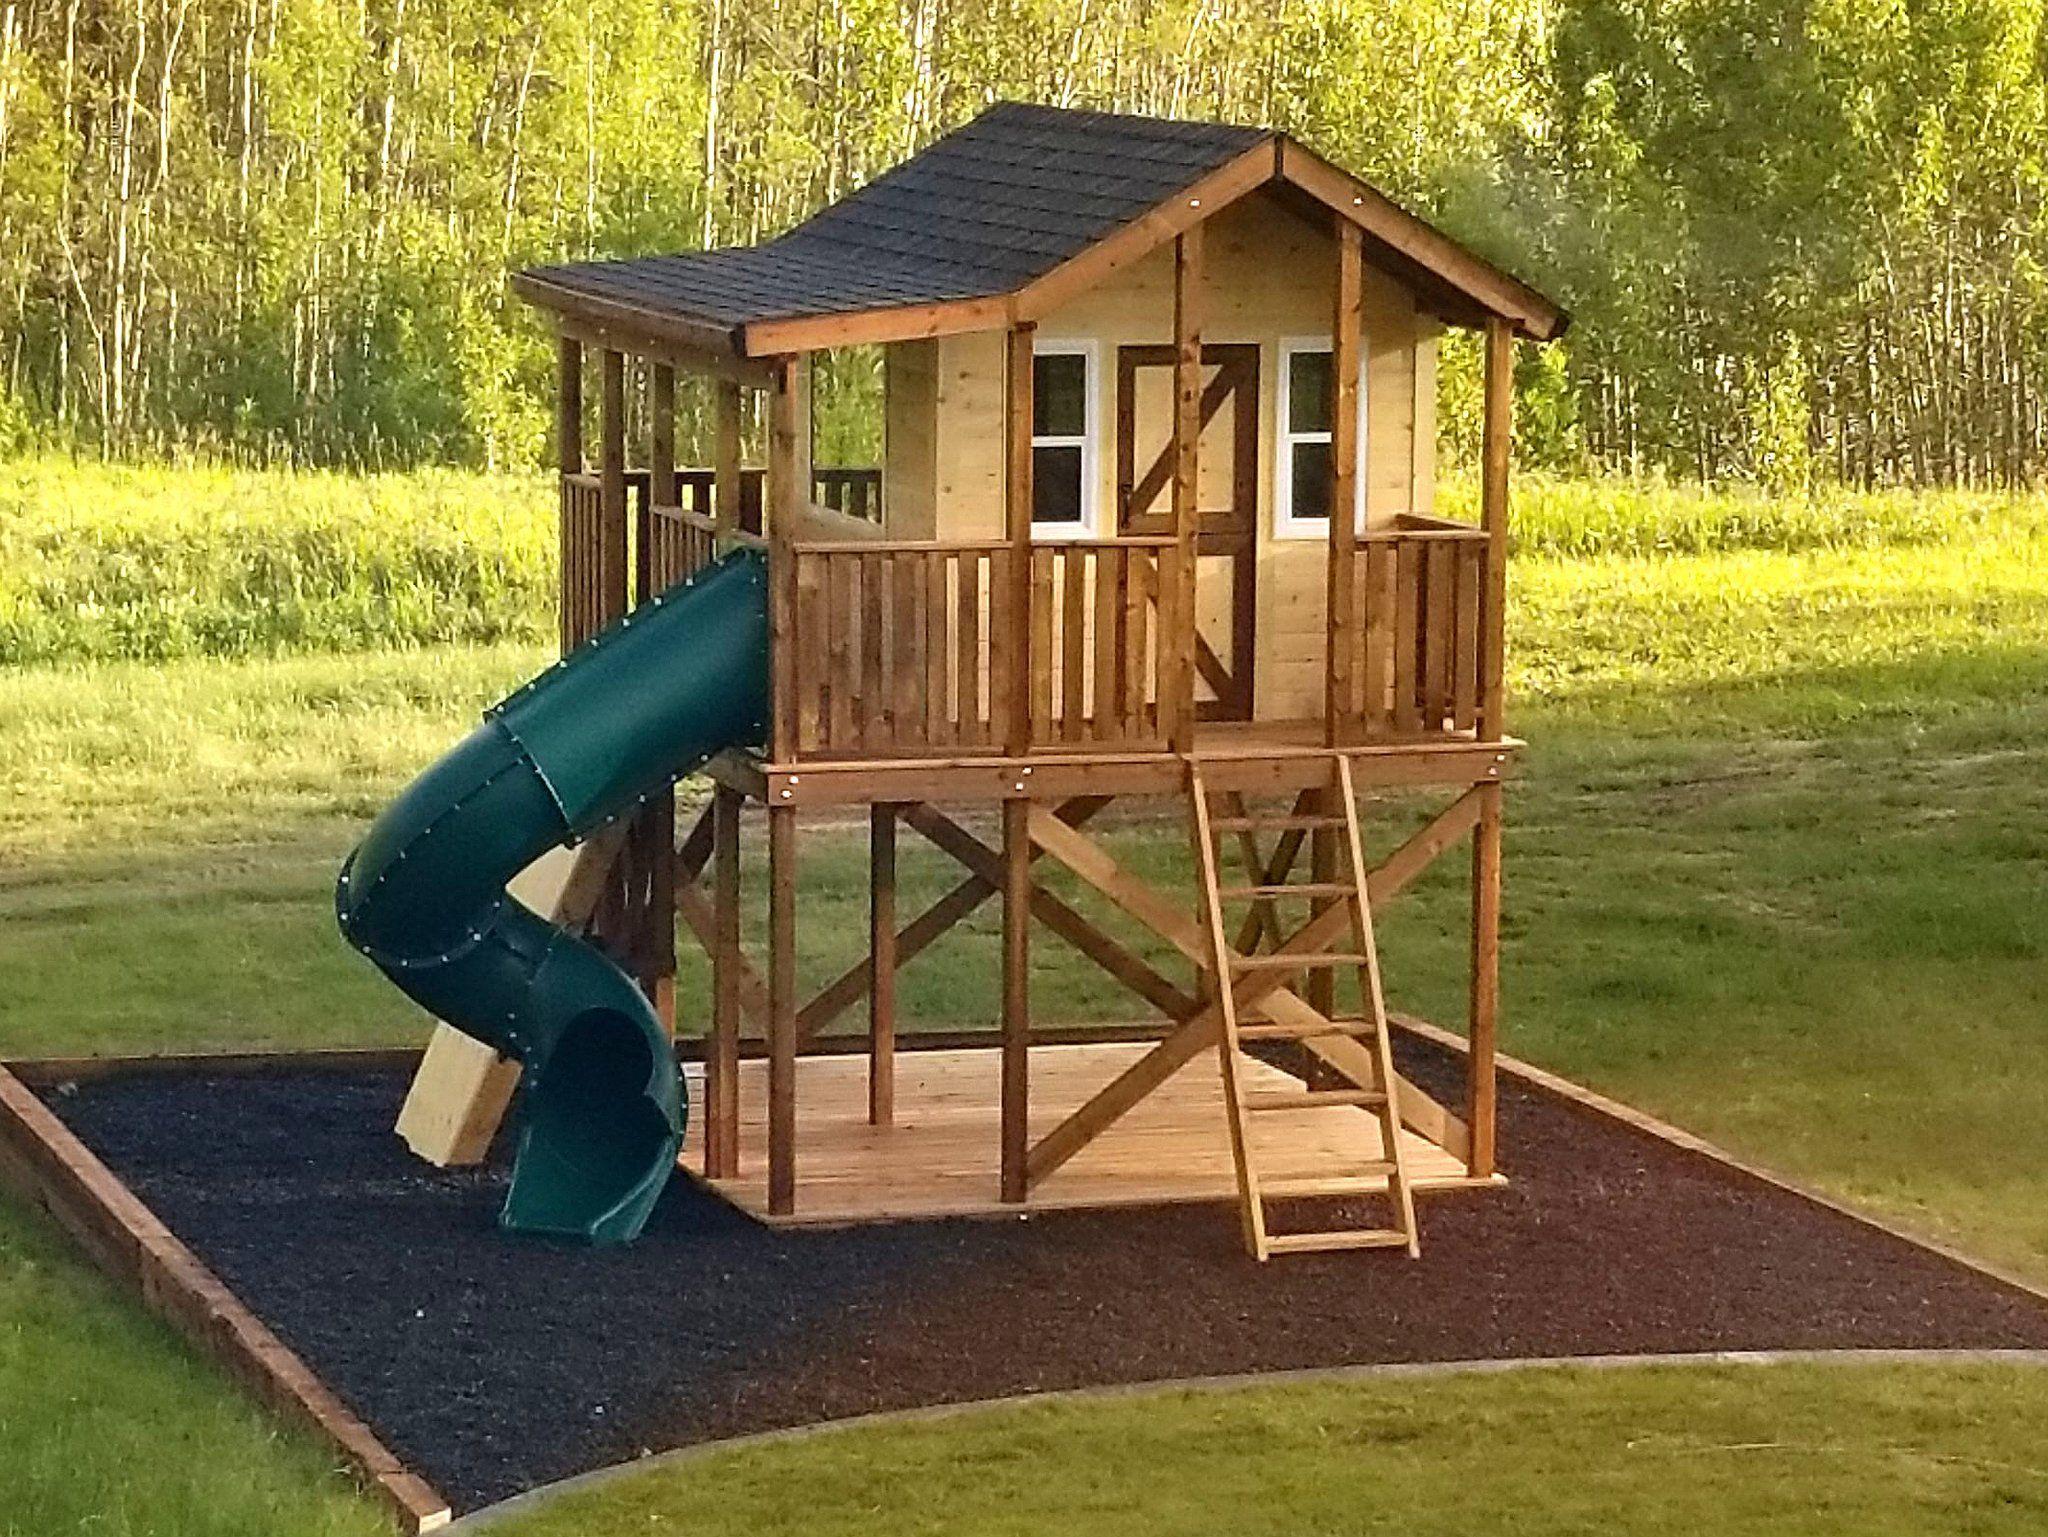 Randy S Ranch Playhouse Plan Play Houses Build A Playhouse Backyard Playground Diy backyard playhouse plans free